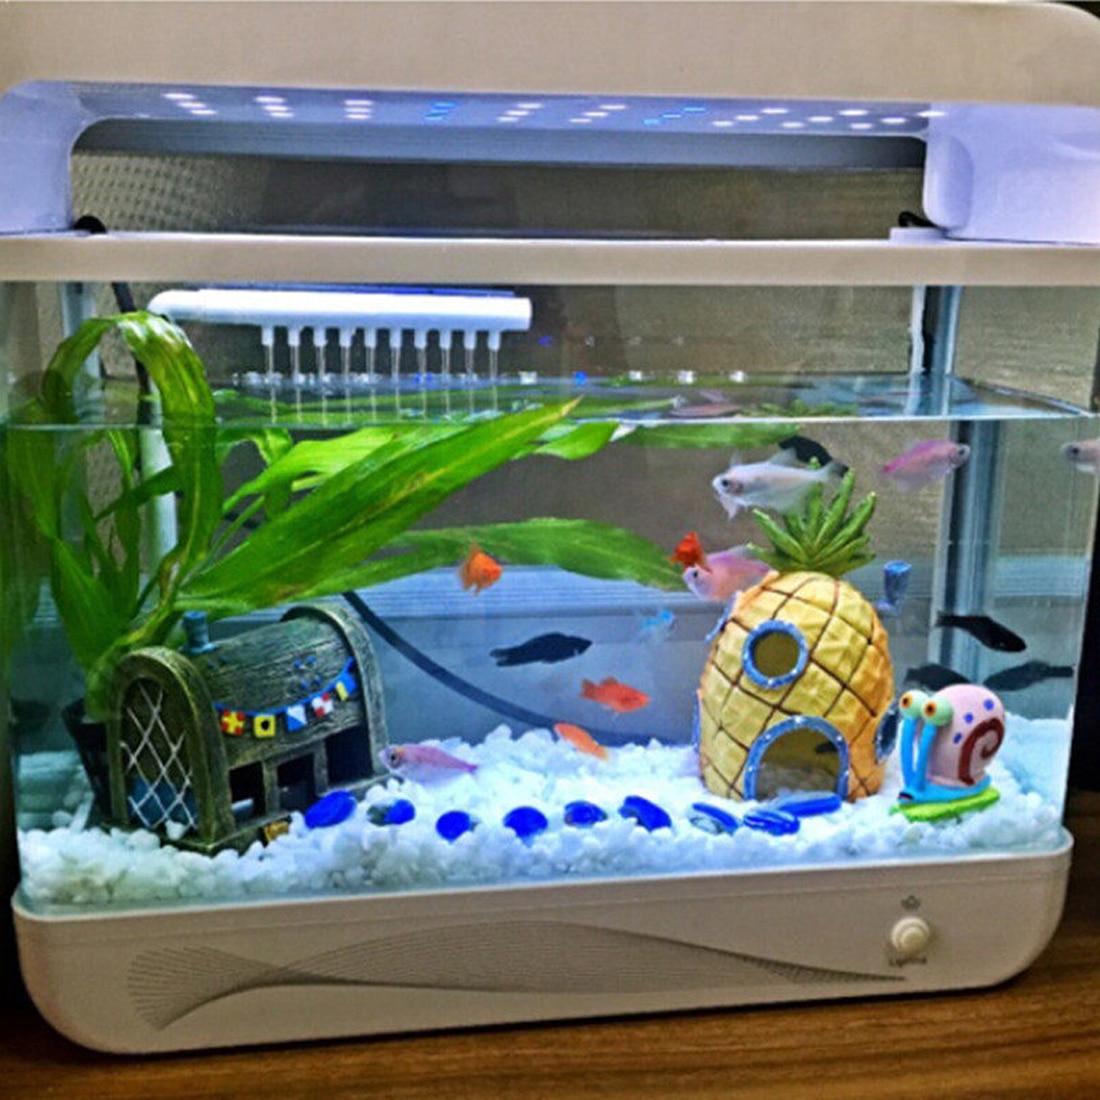 1 St Live Aquarium Fish Huis Nest Hars Grot Imitatie Vulkaan Moss Aquarium Ornament Moss Vis Aquarium Decoratie 100% Hoogwaardige Materialen